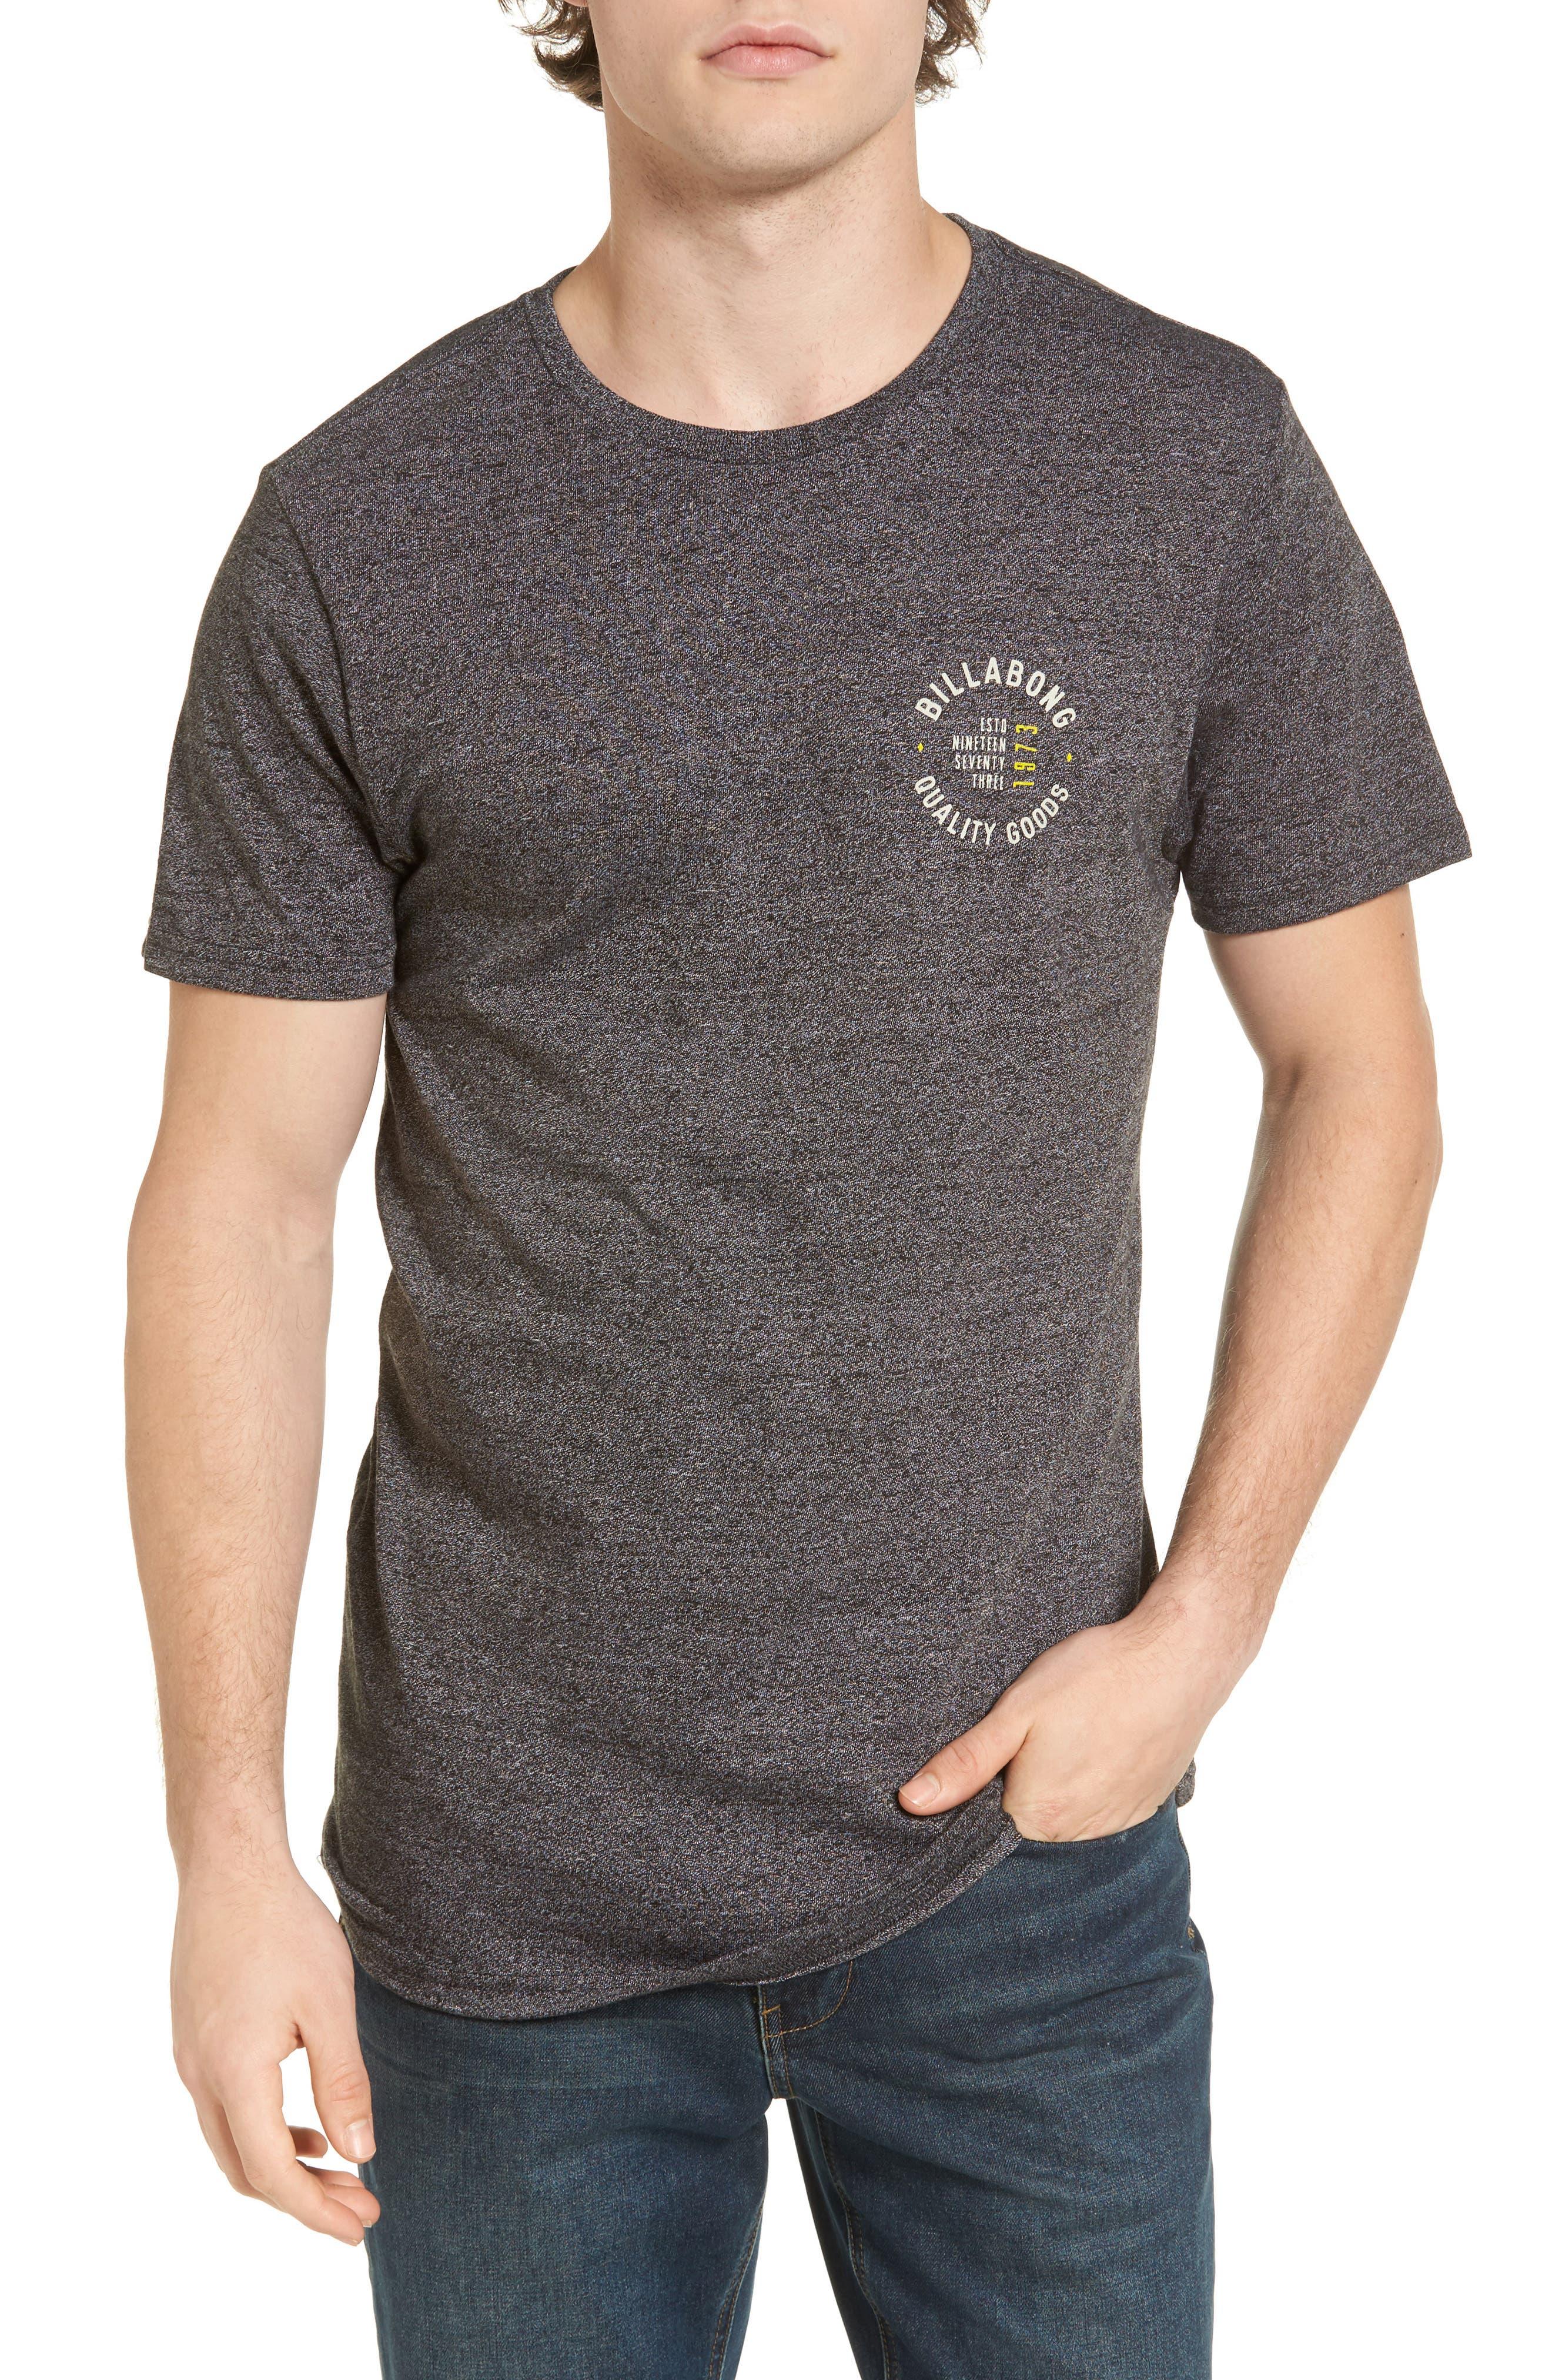 Wallace T-Shirt,                         Main,                         color, Black